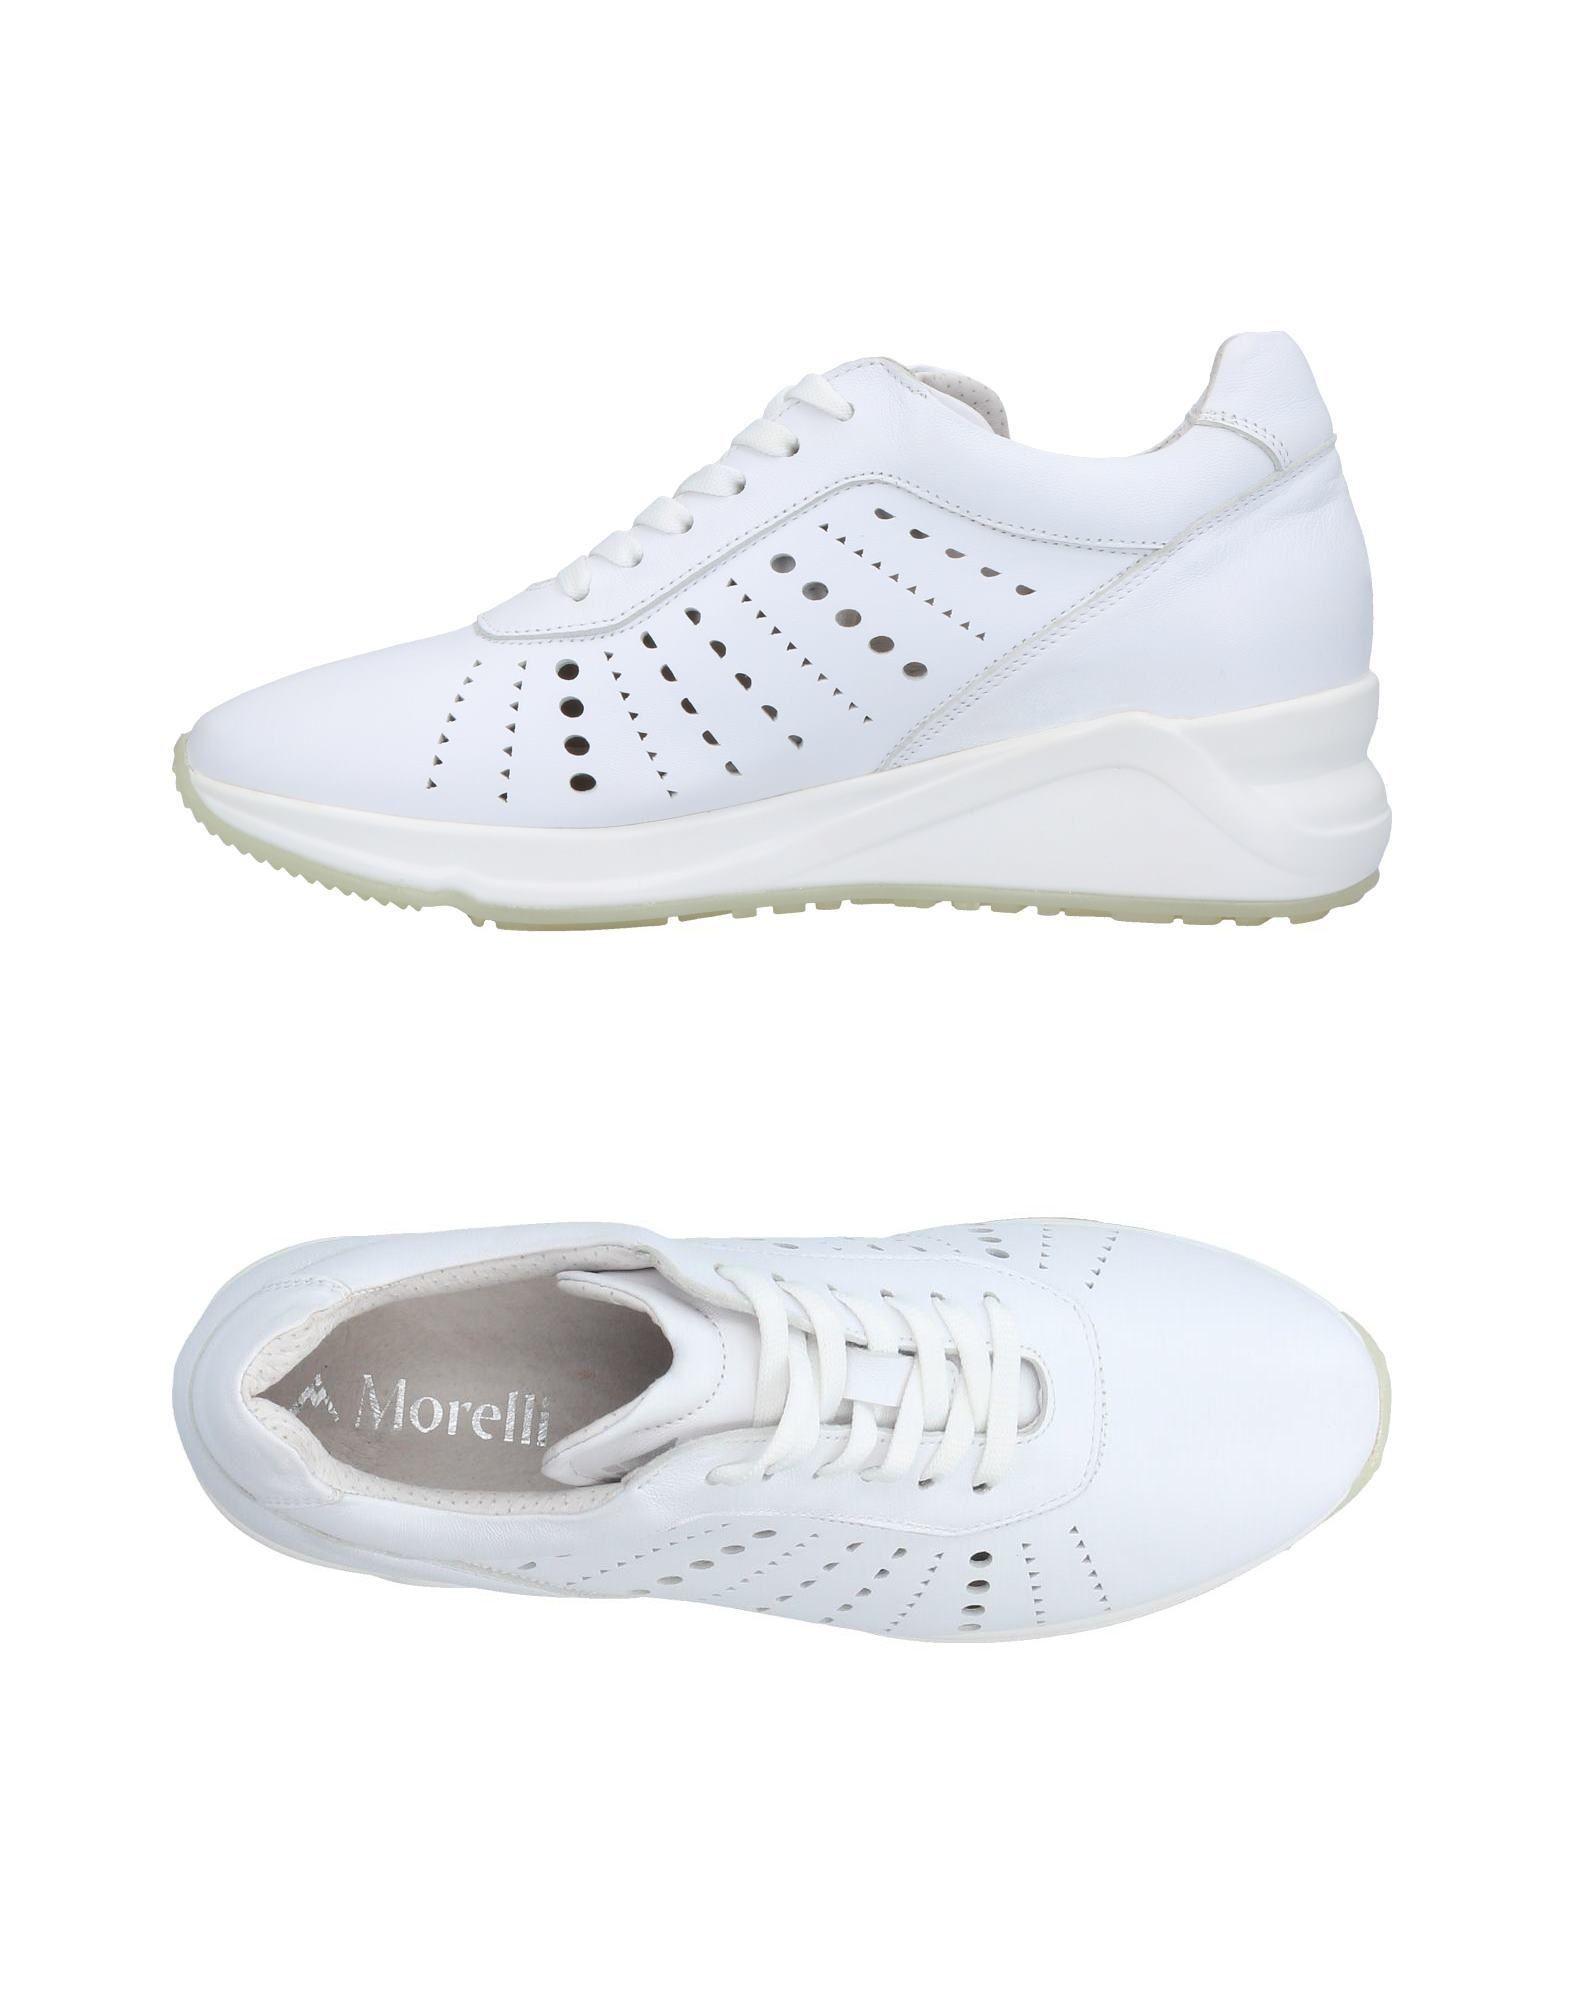 Andrea Morelli Sneakers Damen  11388087OD Gute Qualität beliebte Schuhe